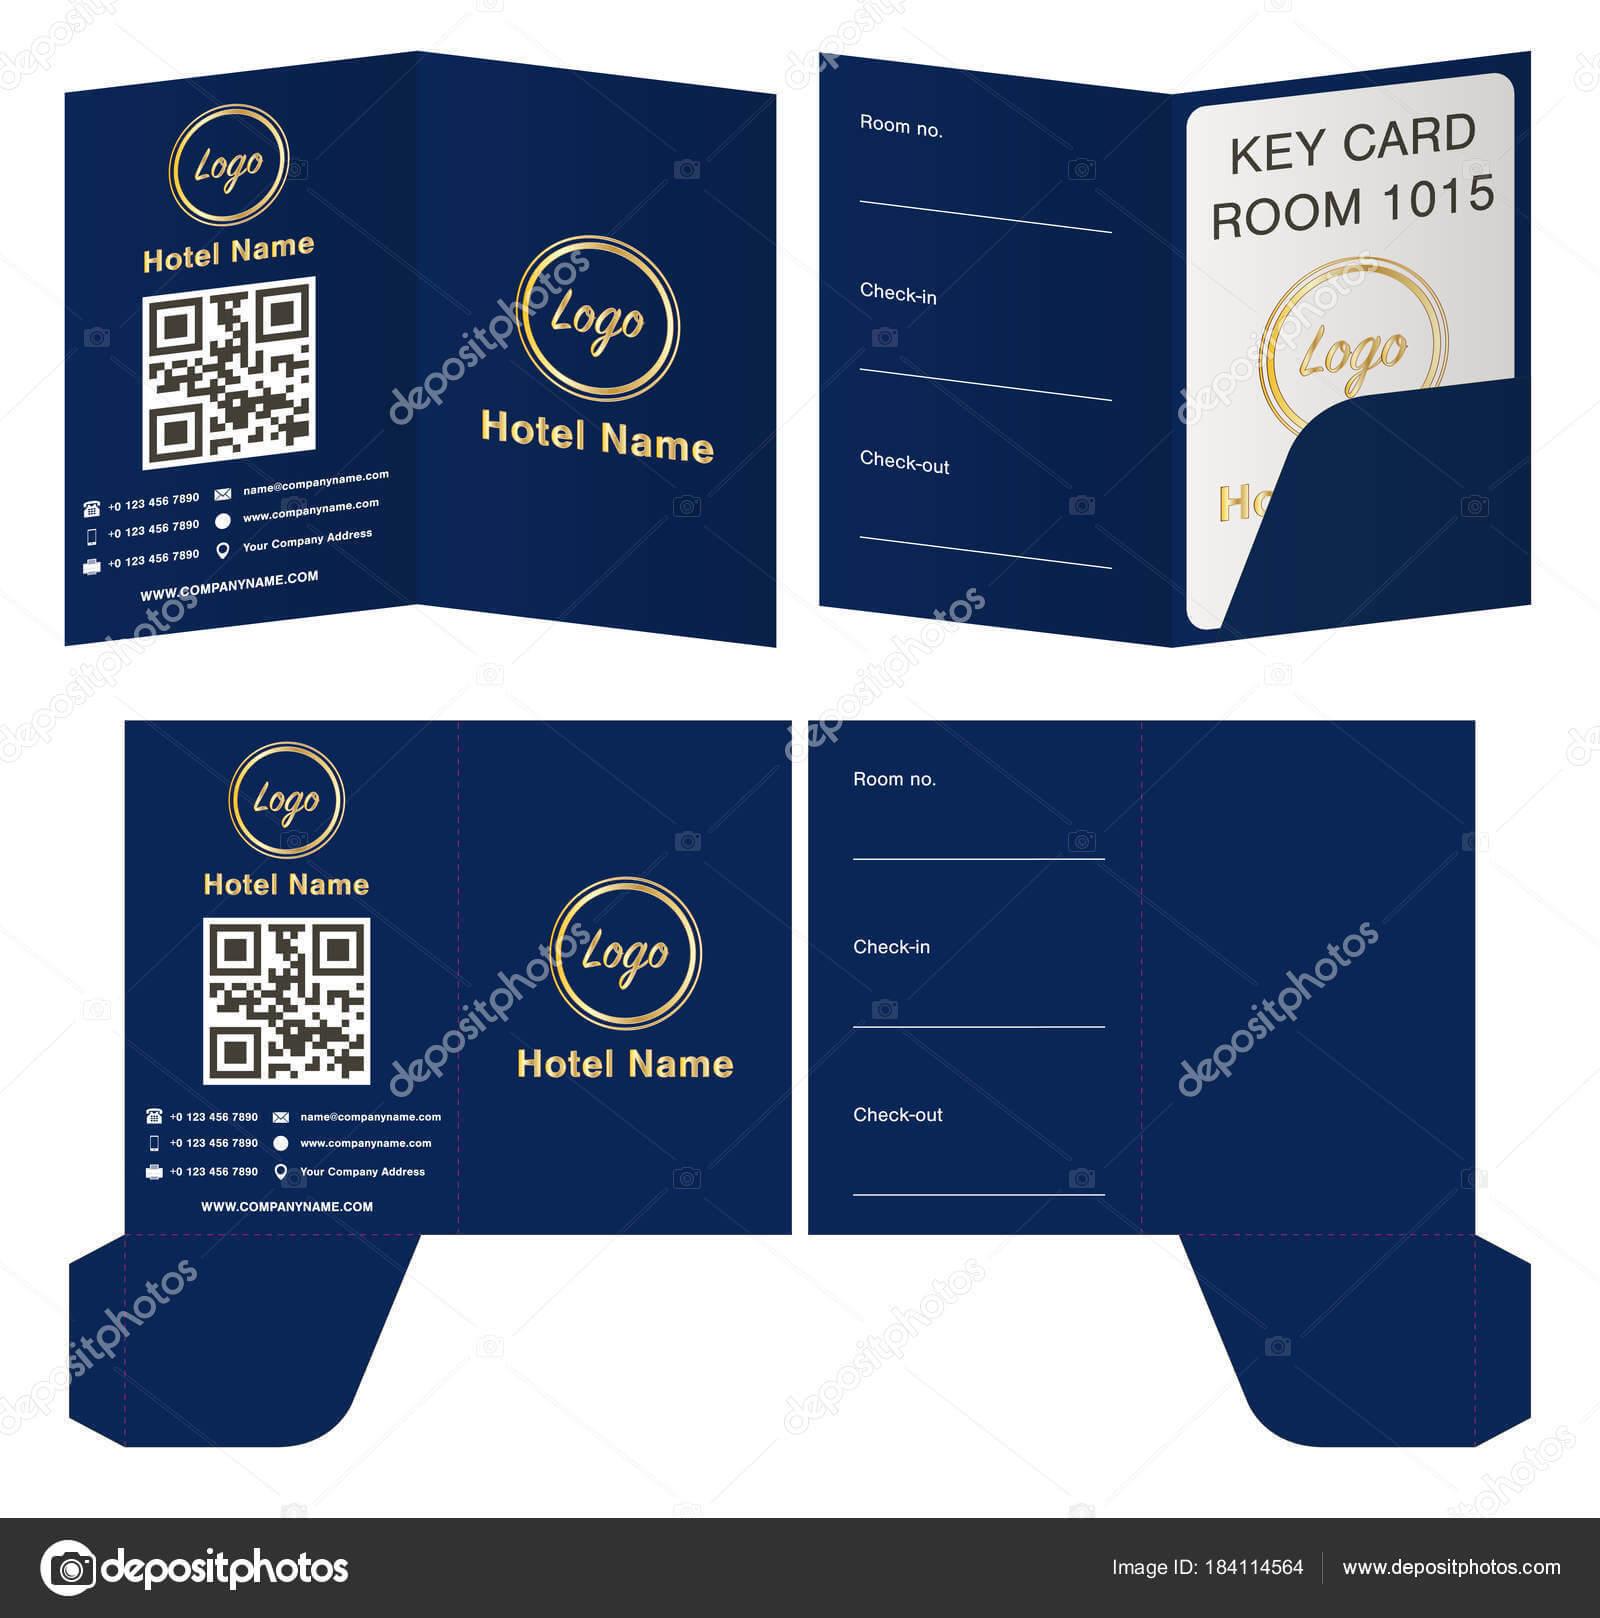 Key Card Holder Template | Hotel Key Card Holder Folder Regarding Hotel Key Card Template